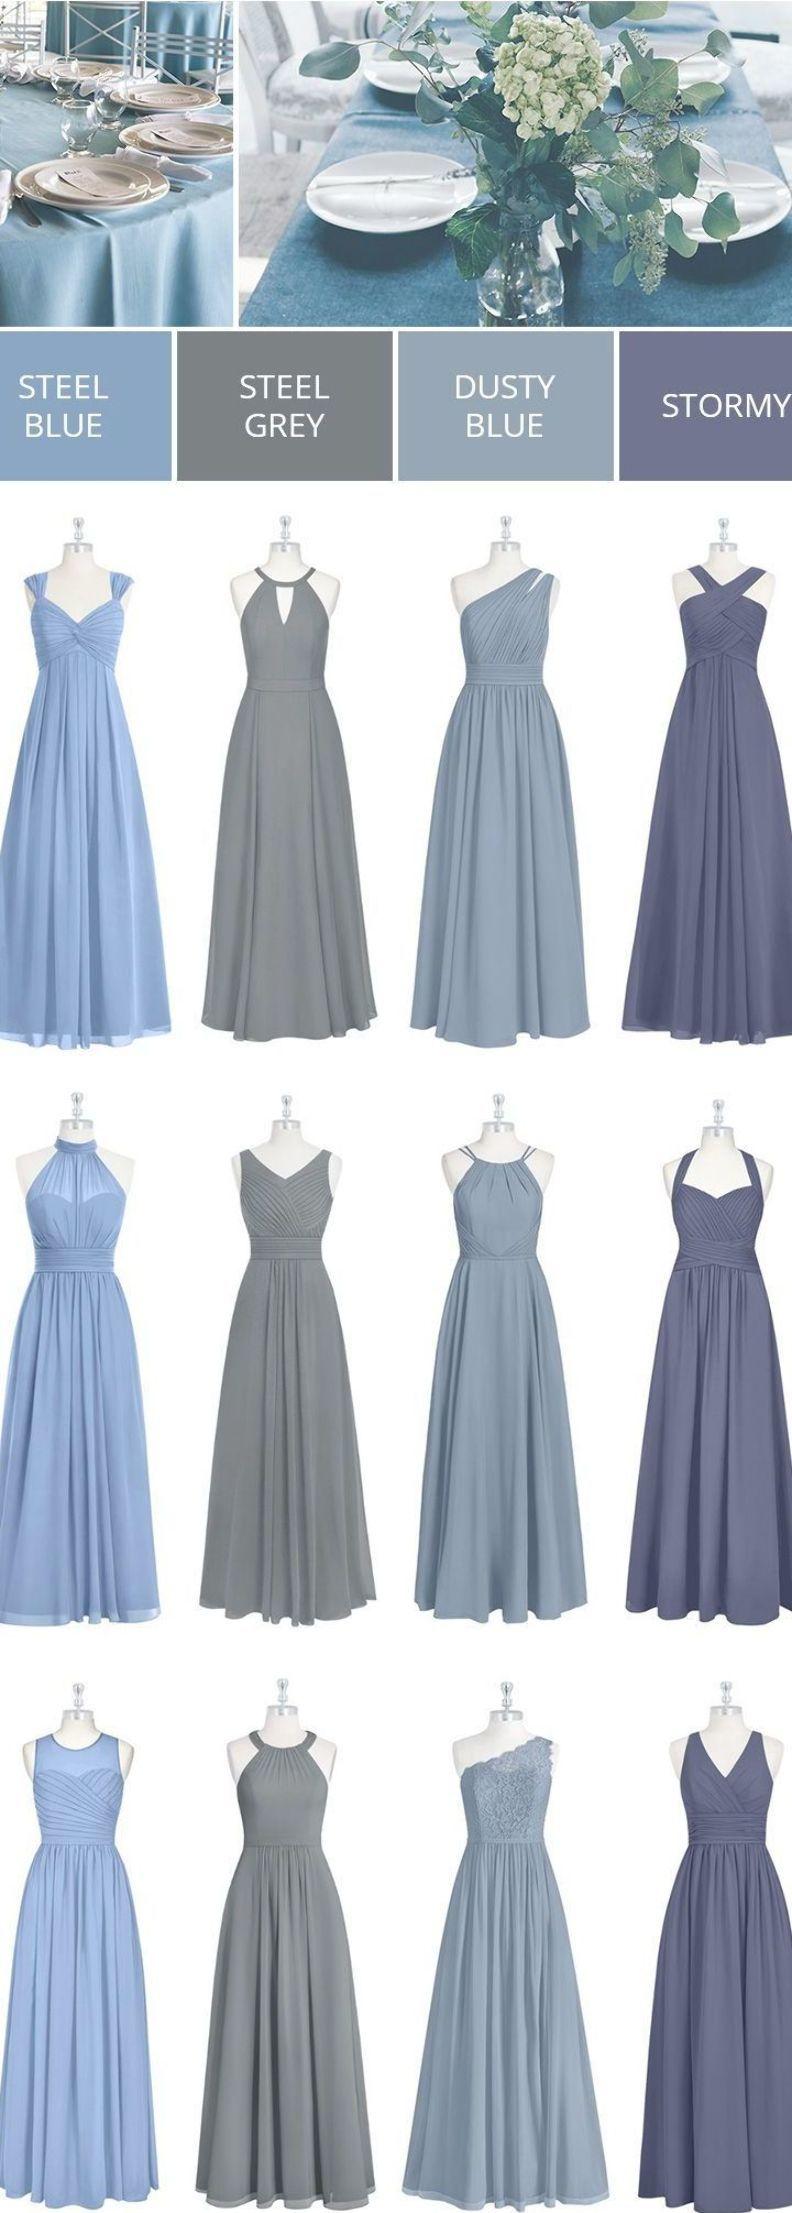 Blue Bridesmaid Dresses In Color Mix Matches Dusty Blue Stormy Steel Gre Bridesmaid Dresses Long Blue Steel Blue Bridesmaid Dresses Blue Bridesmaid Dresses [ 2213 x 792 Pixel ]